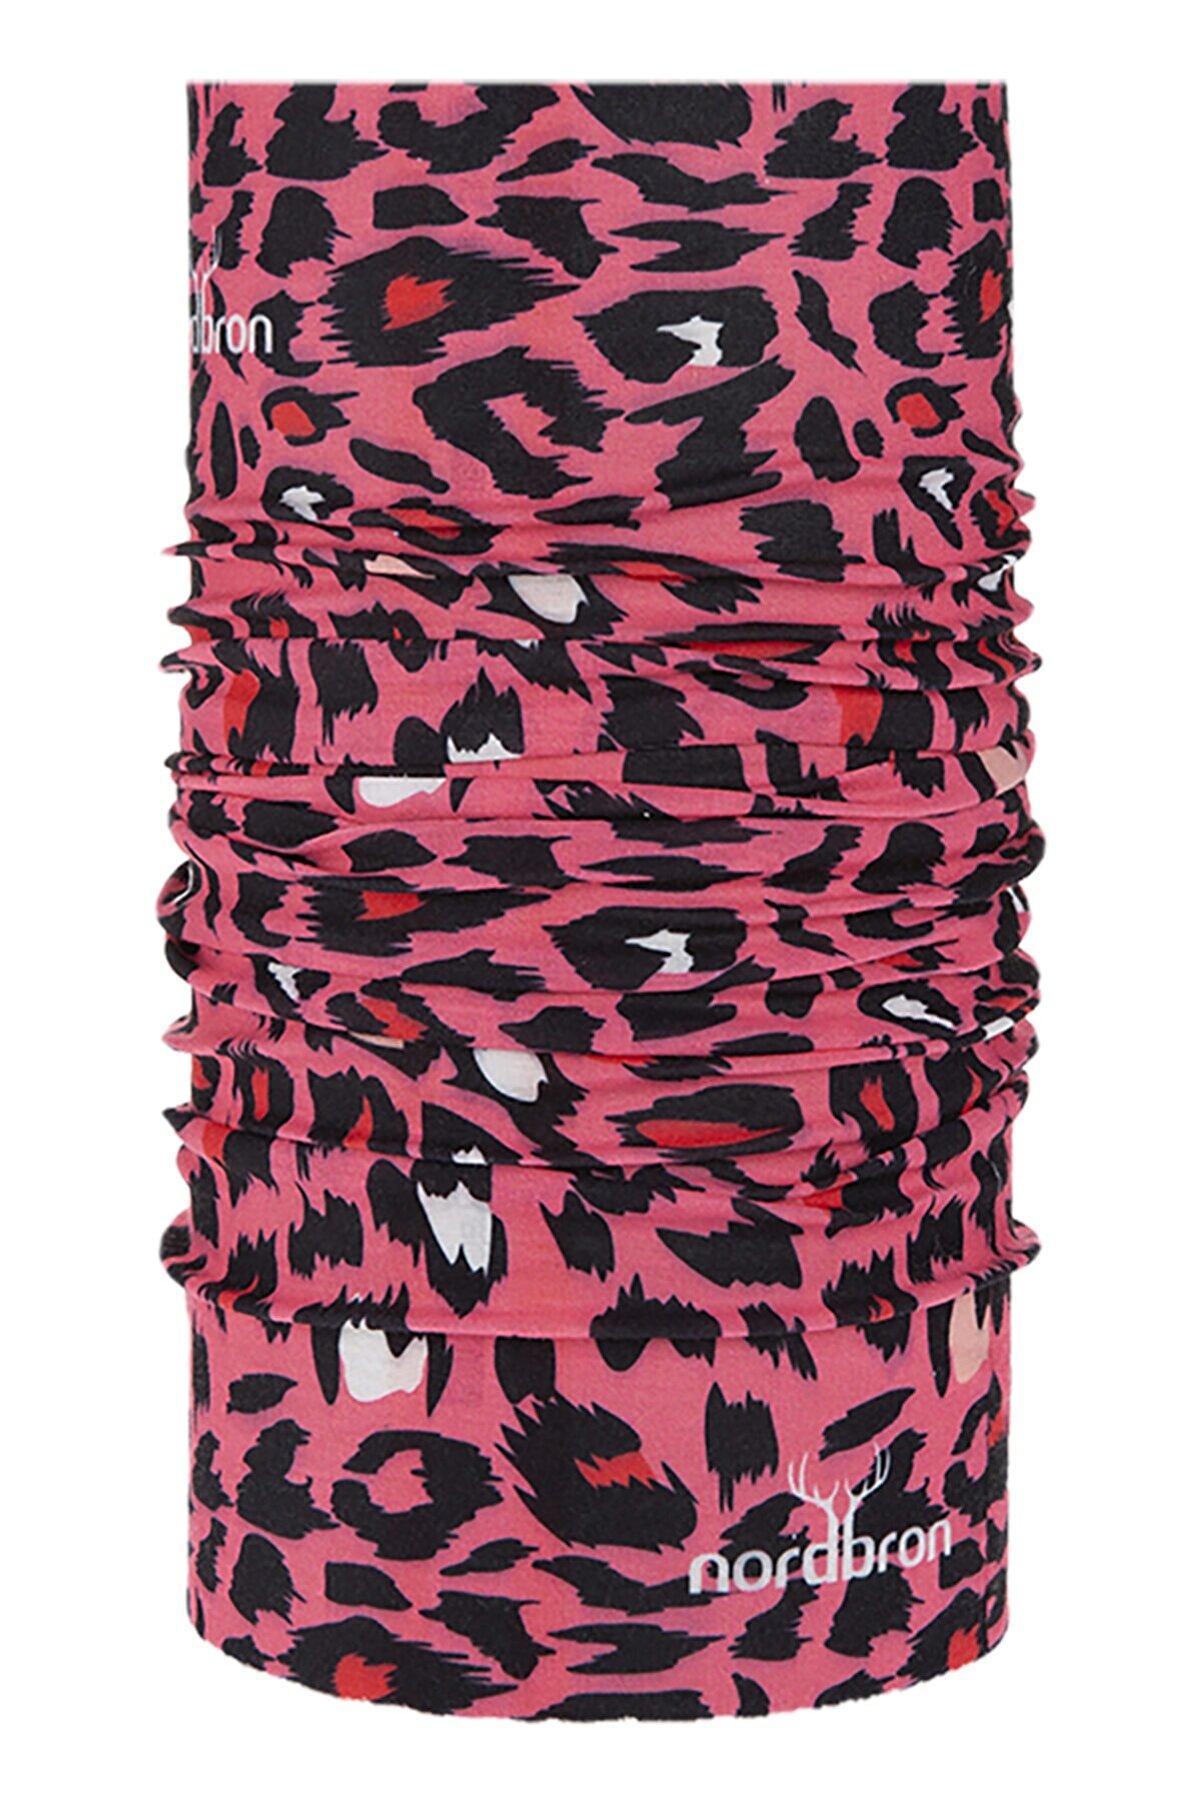 Nordbron Animal Print-classic Pink